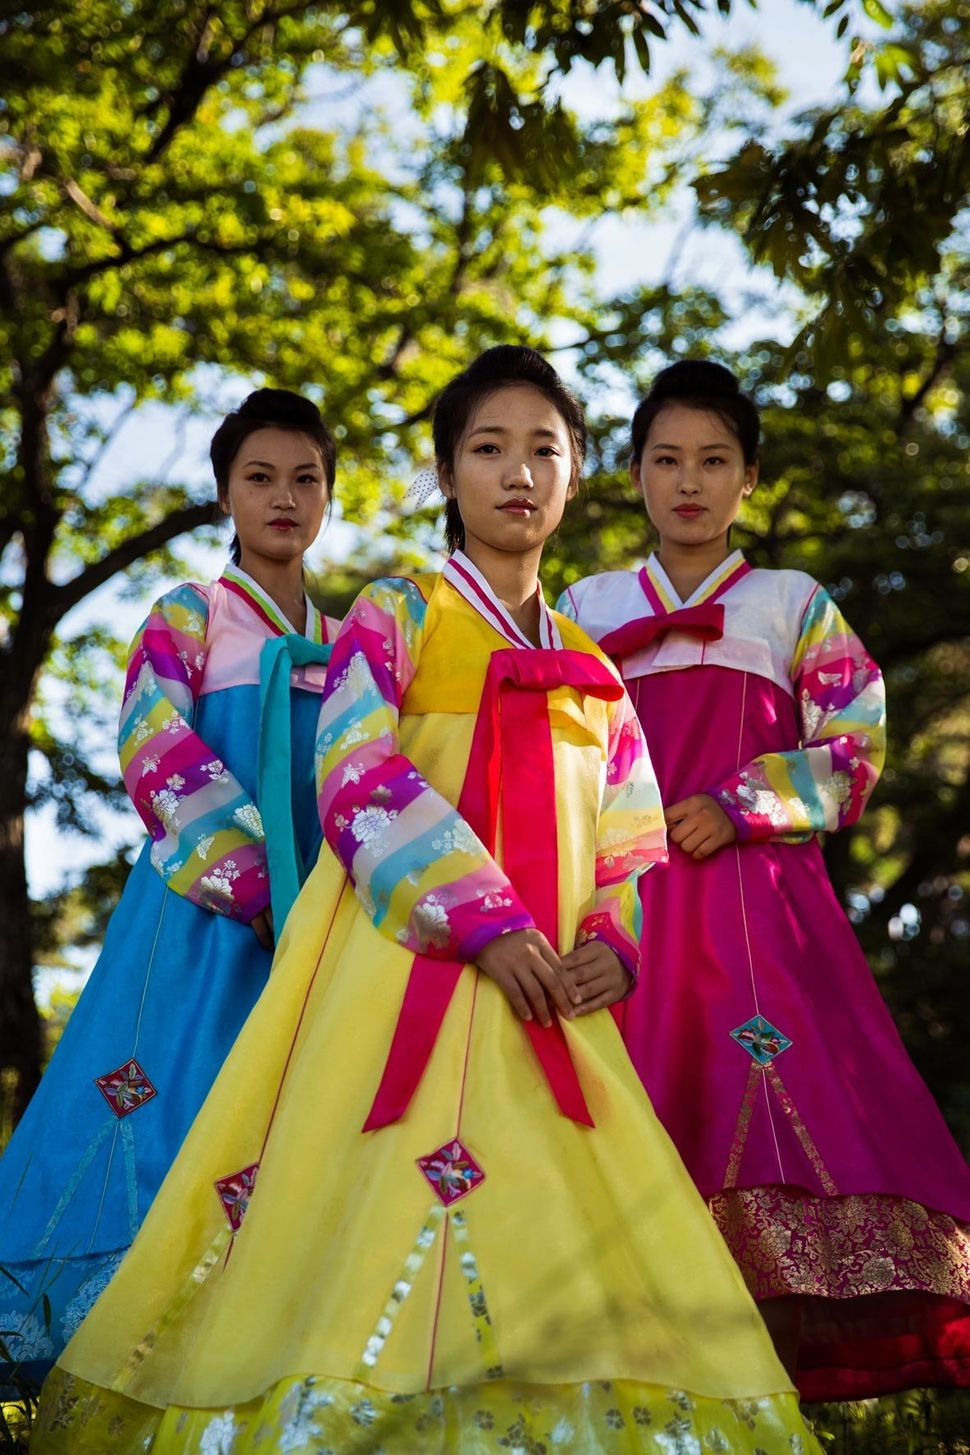 In Sinuiju, a city bordering China